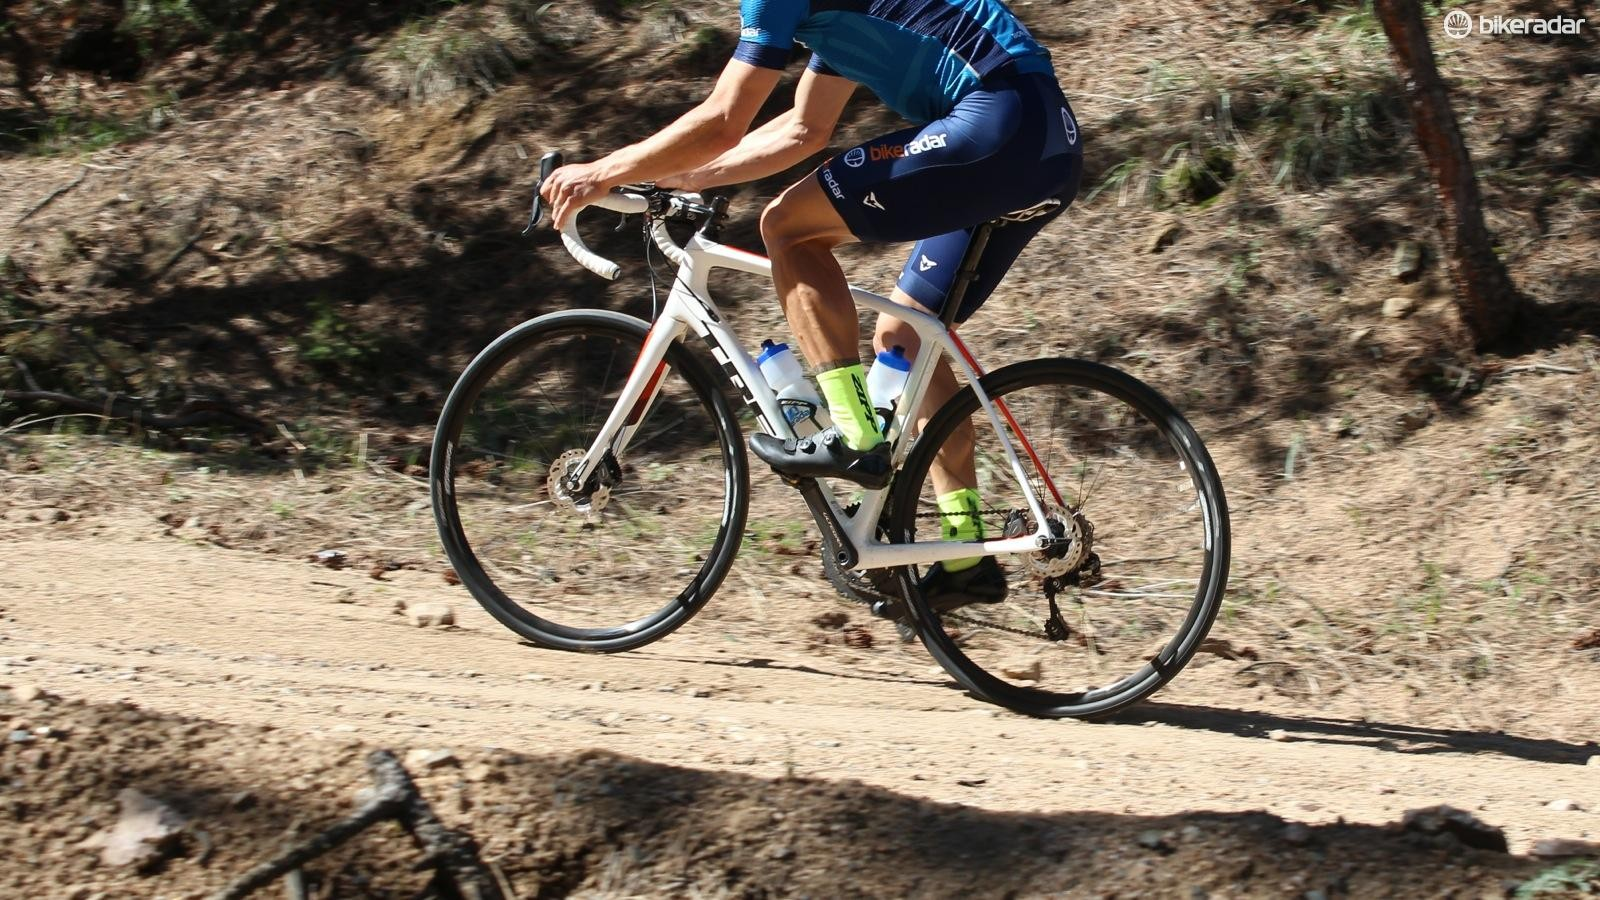 b1cc0926fe Specialized Roubaix vs. Trek Domane  battle of the plush - BikeRadar